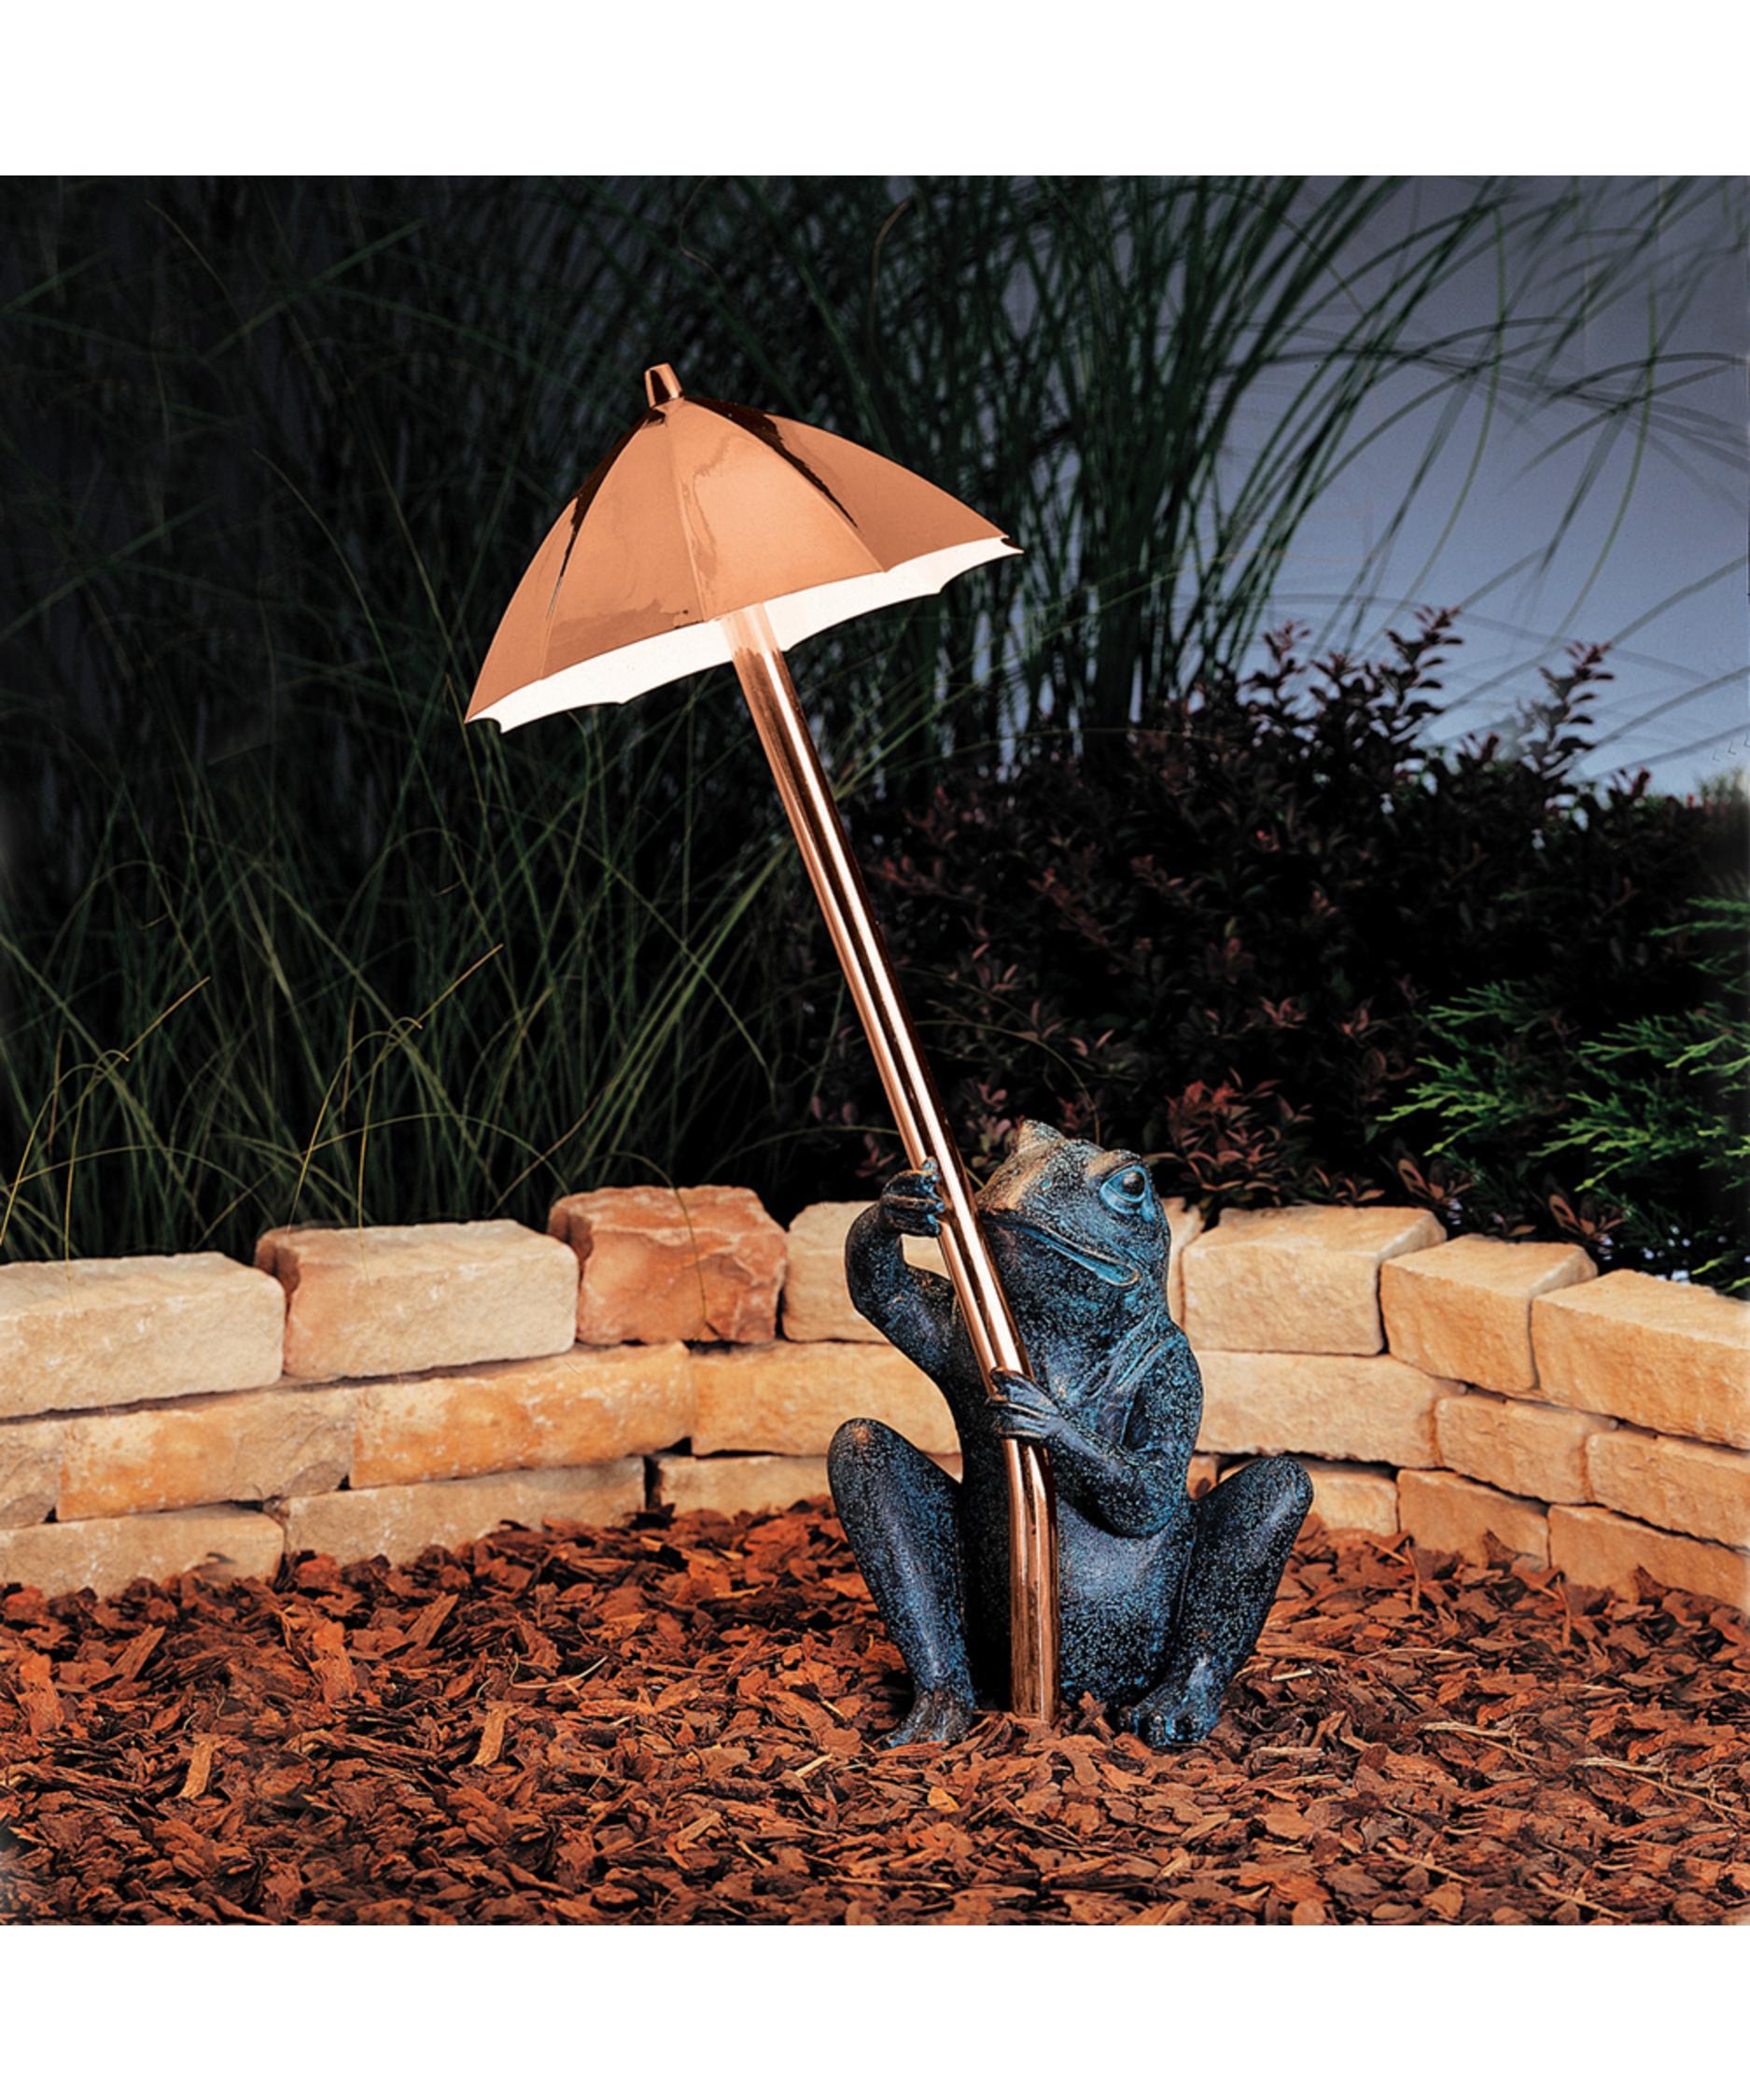 Kichler 15307 Frog and Umbrella 1 Light Pathway Light | Capitol ...